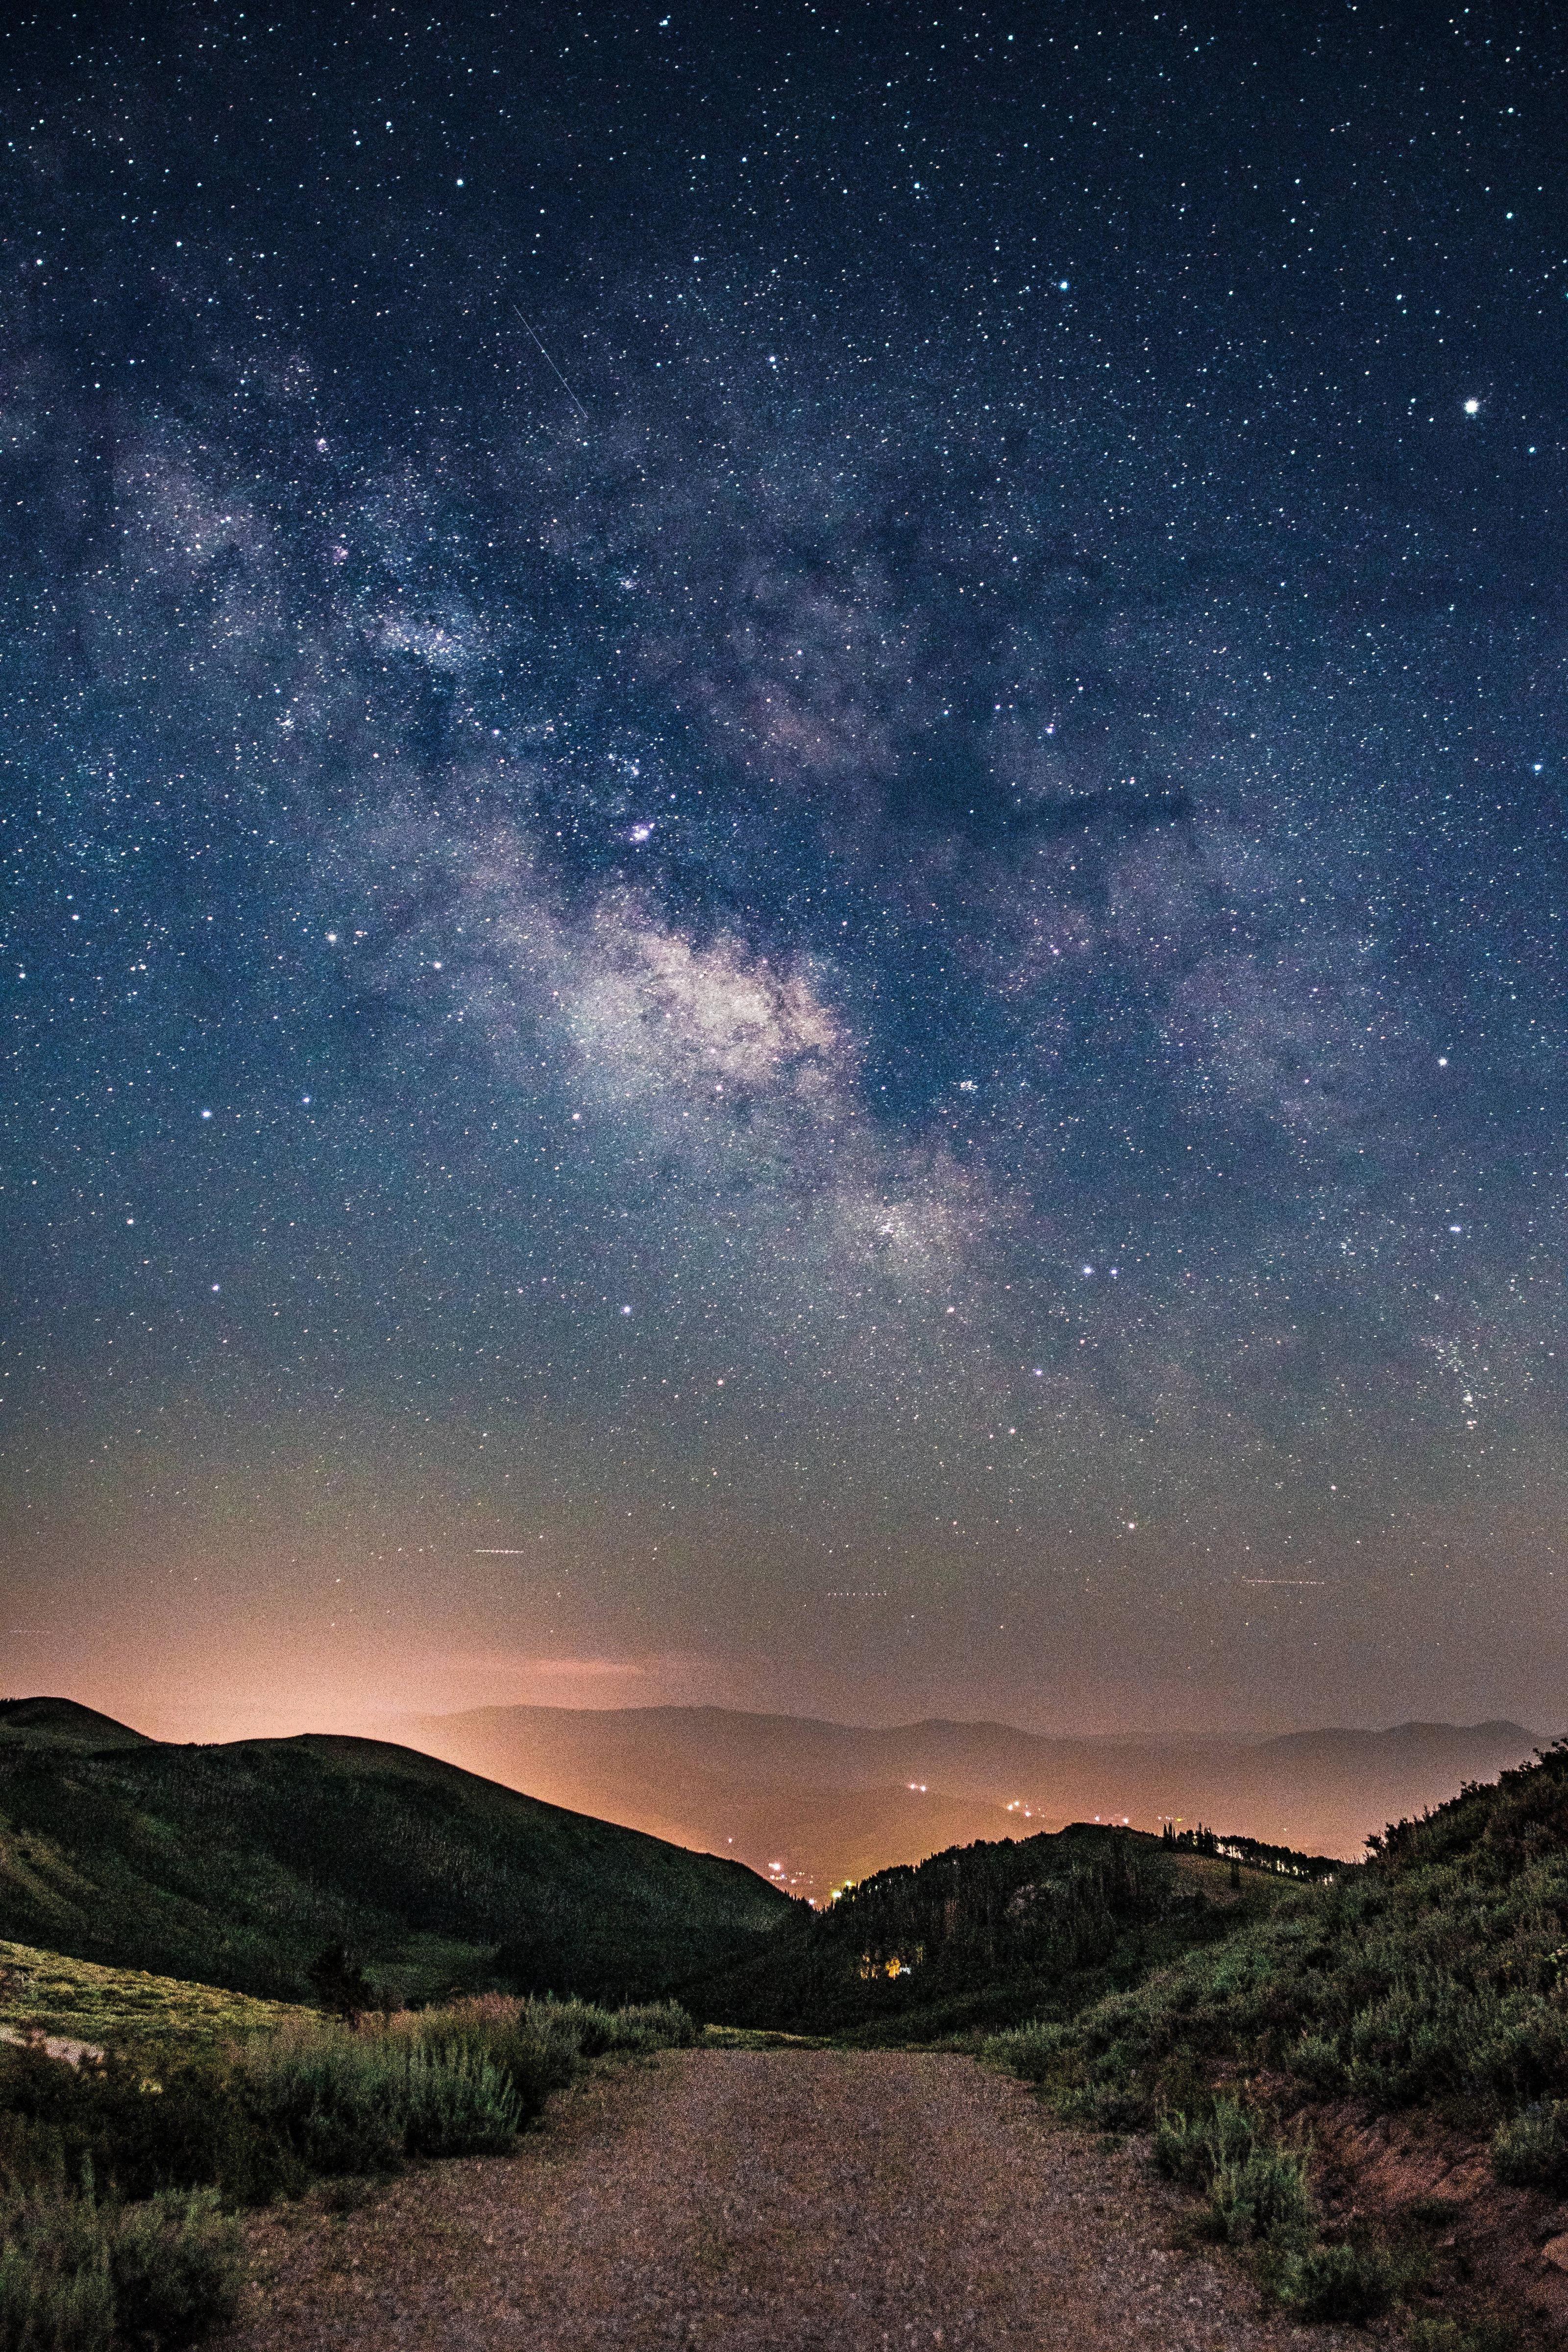 Core Of The Milky Way Above Park City Utah Usa Oc 4000x6000 Http Ift Tt 2k56oc7 Park City Utah Utah Usa Milky Way